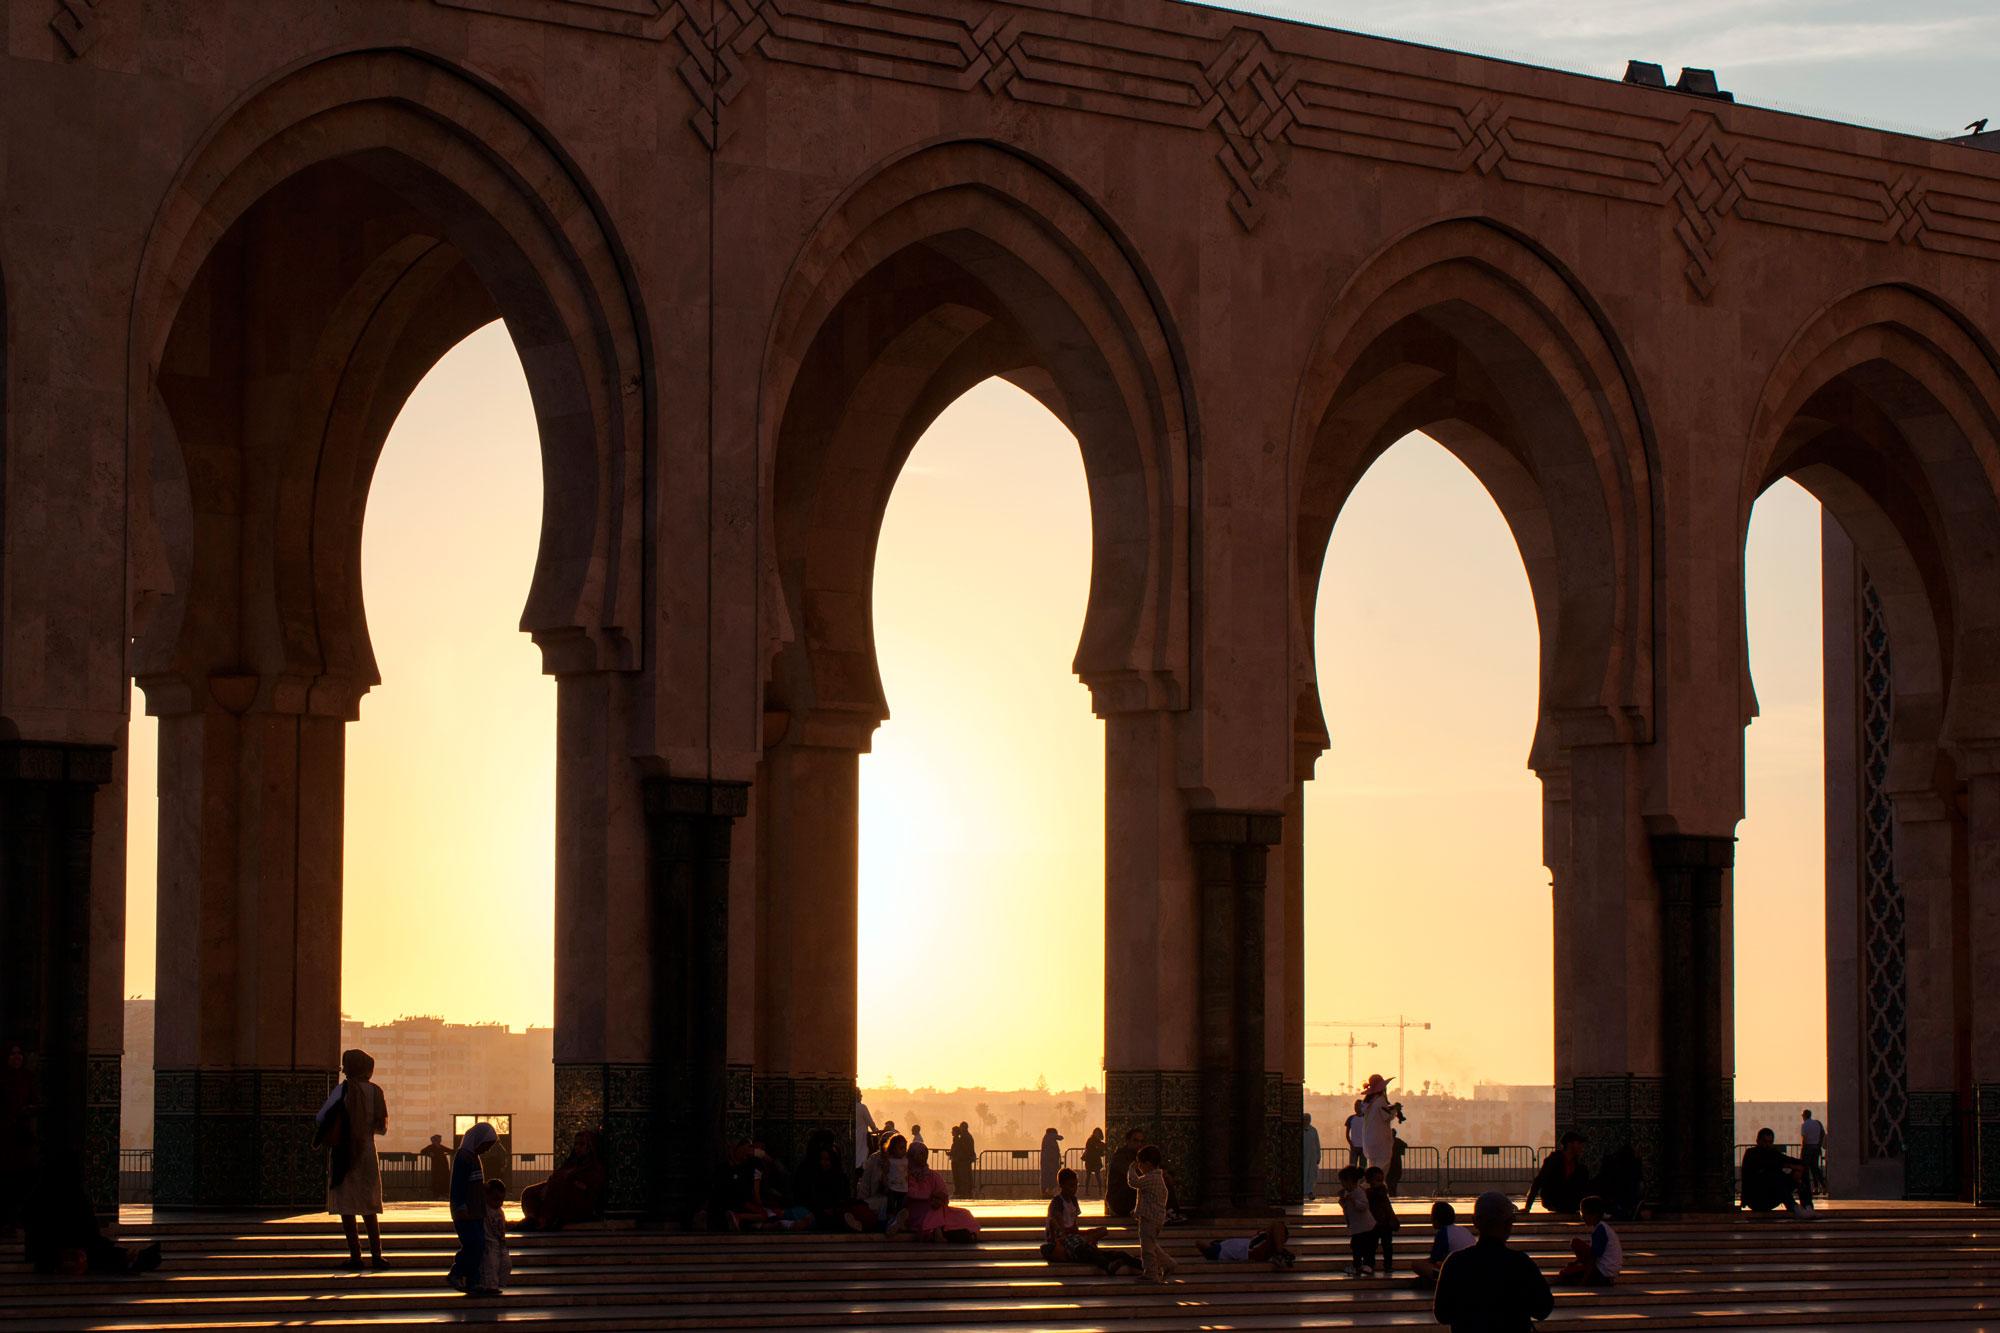 architecture religieuse mosquée Hassan II Casablanca soleil couchant